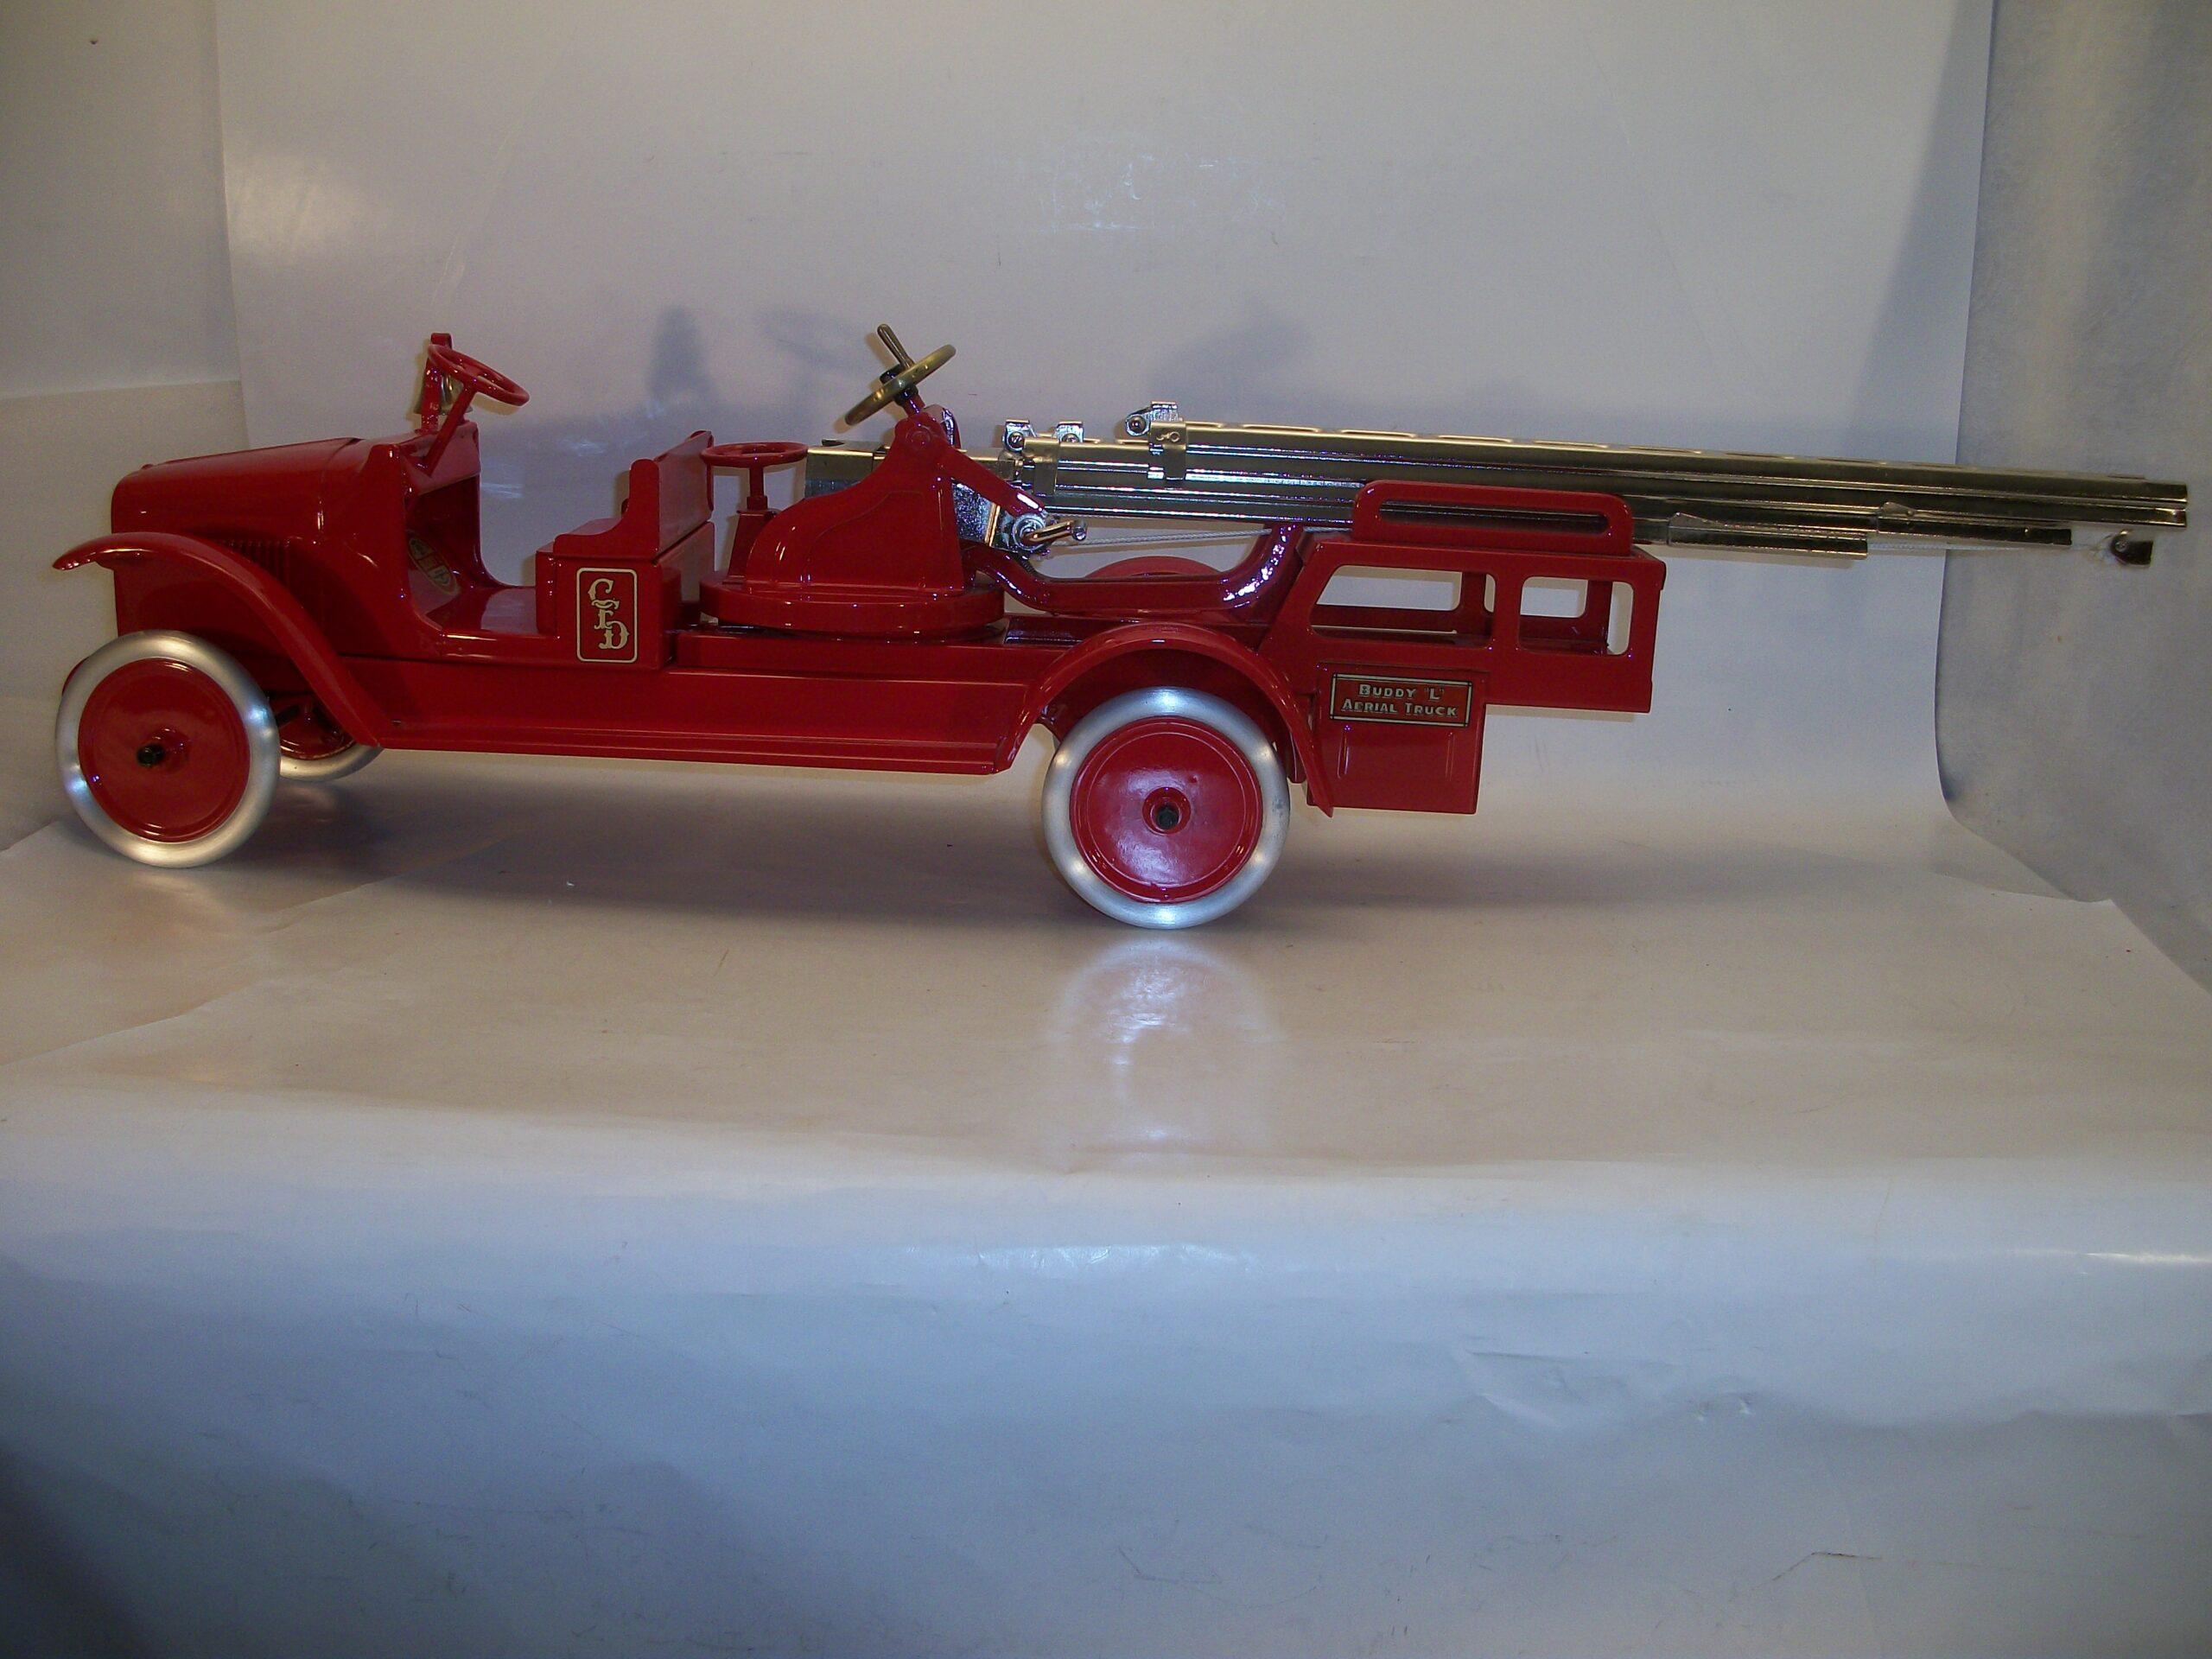 Buddy L Aerial Ladder Fire Truck Replacement Sticker Set BL-204